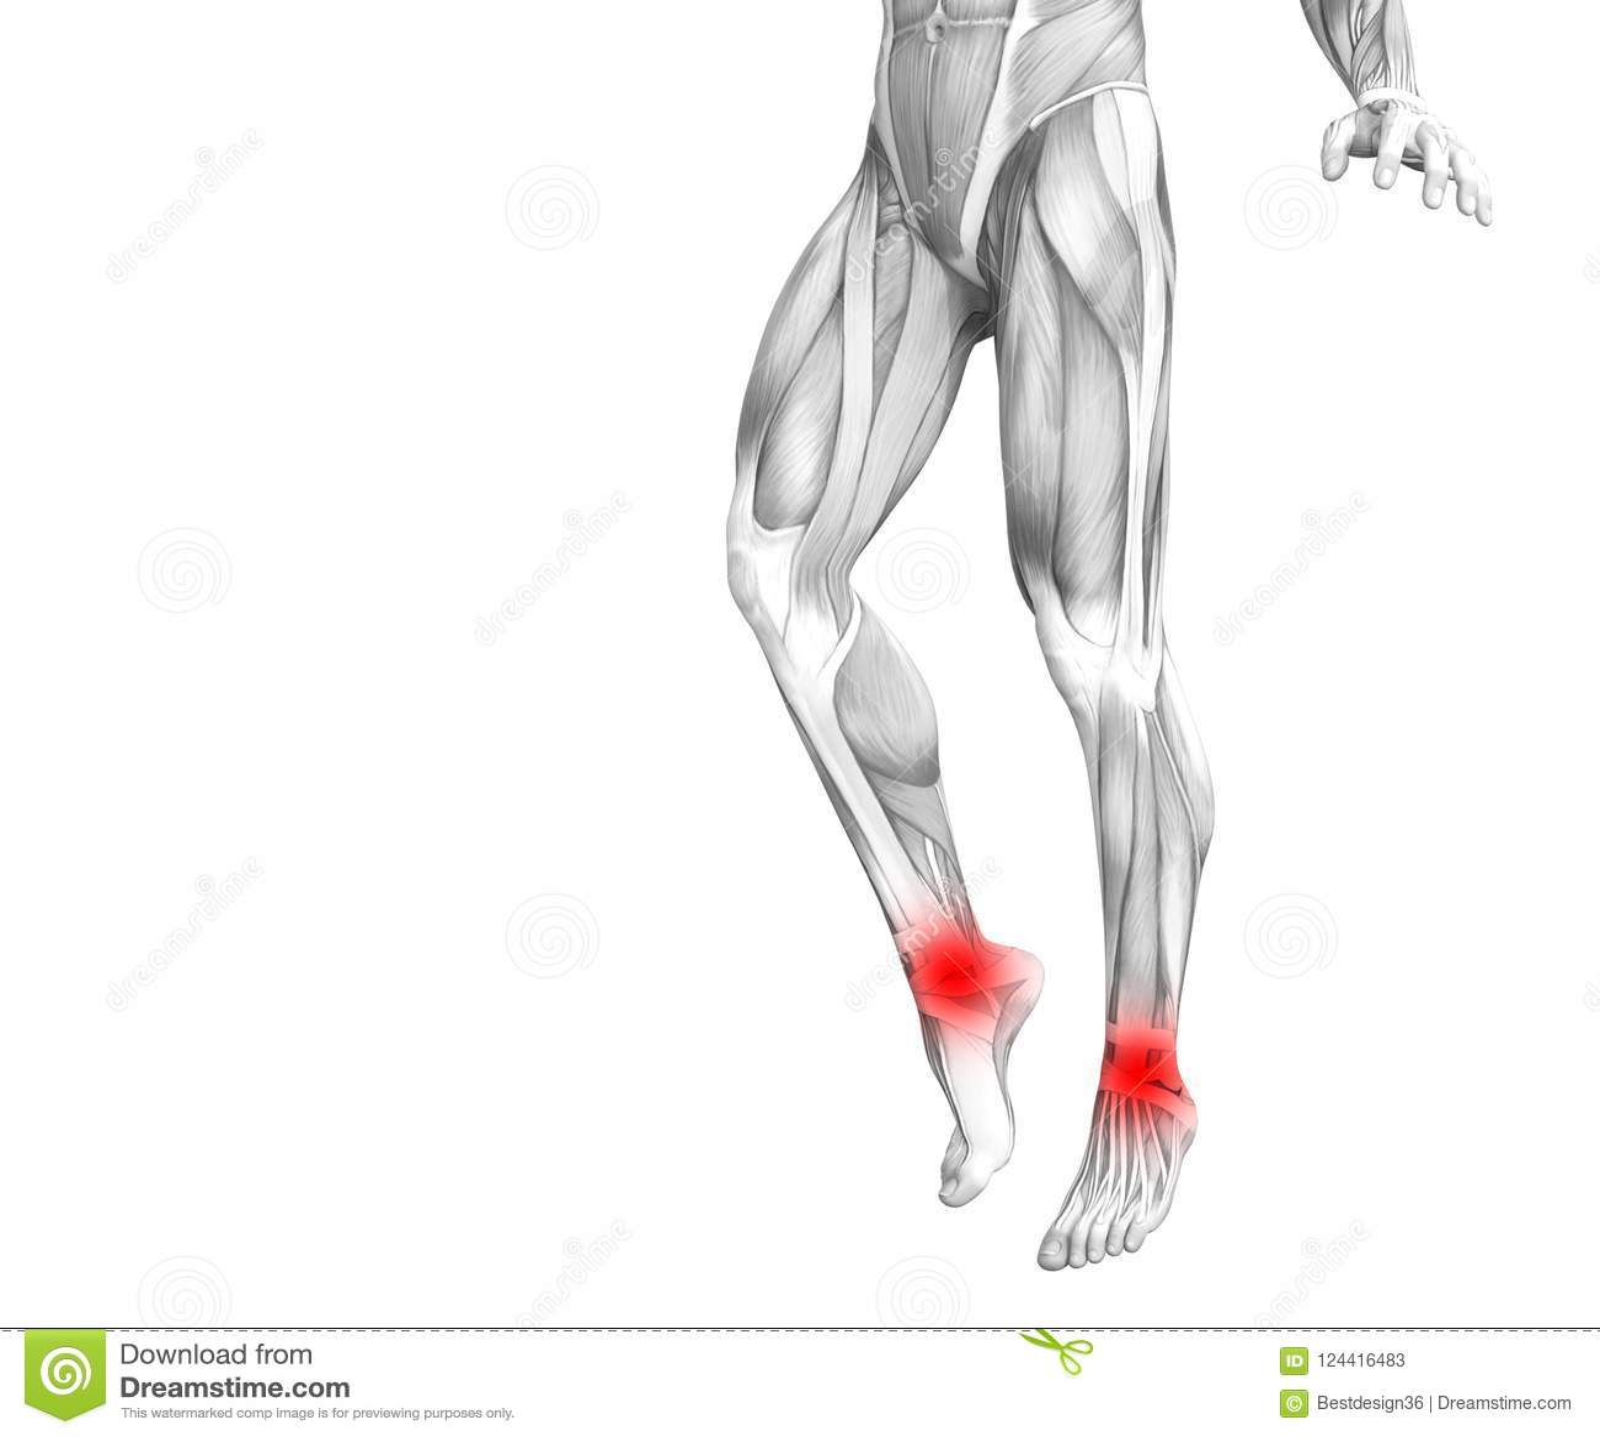 Ankle Human Anatomy Hot Spot Inflammation Stock Illustration ...